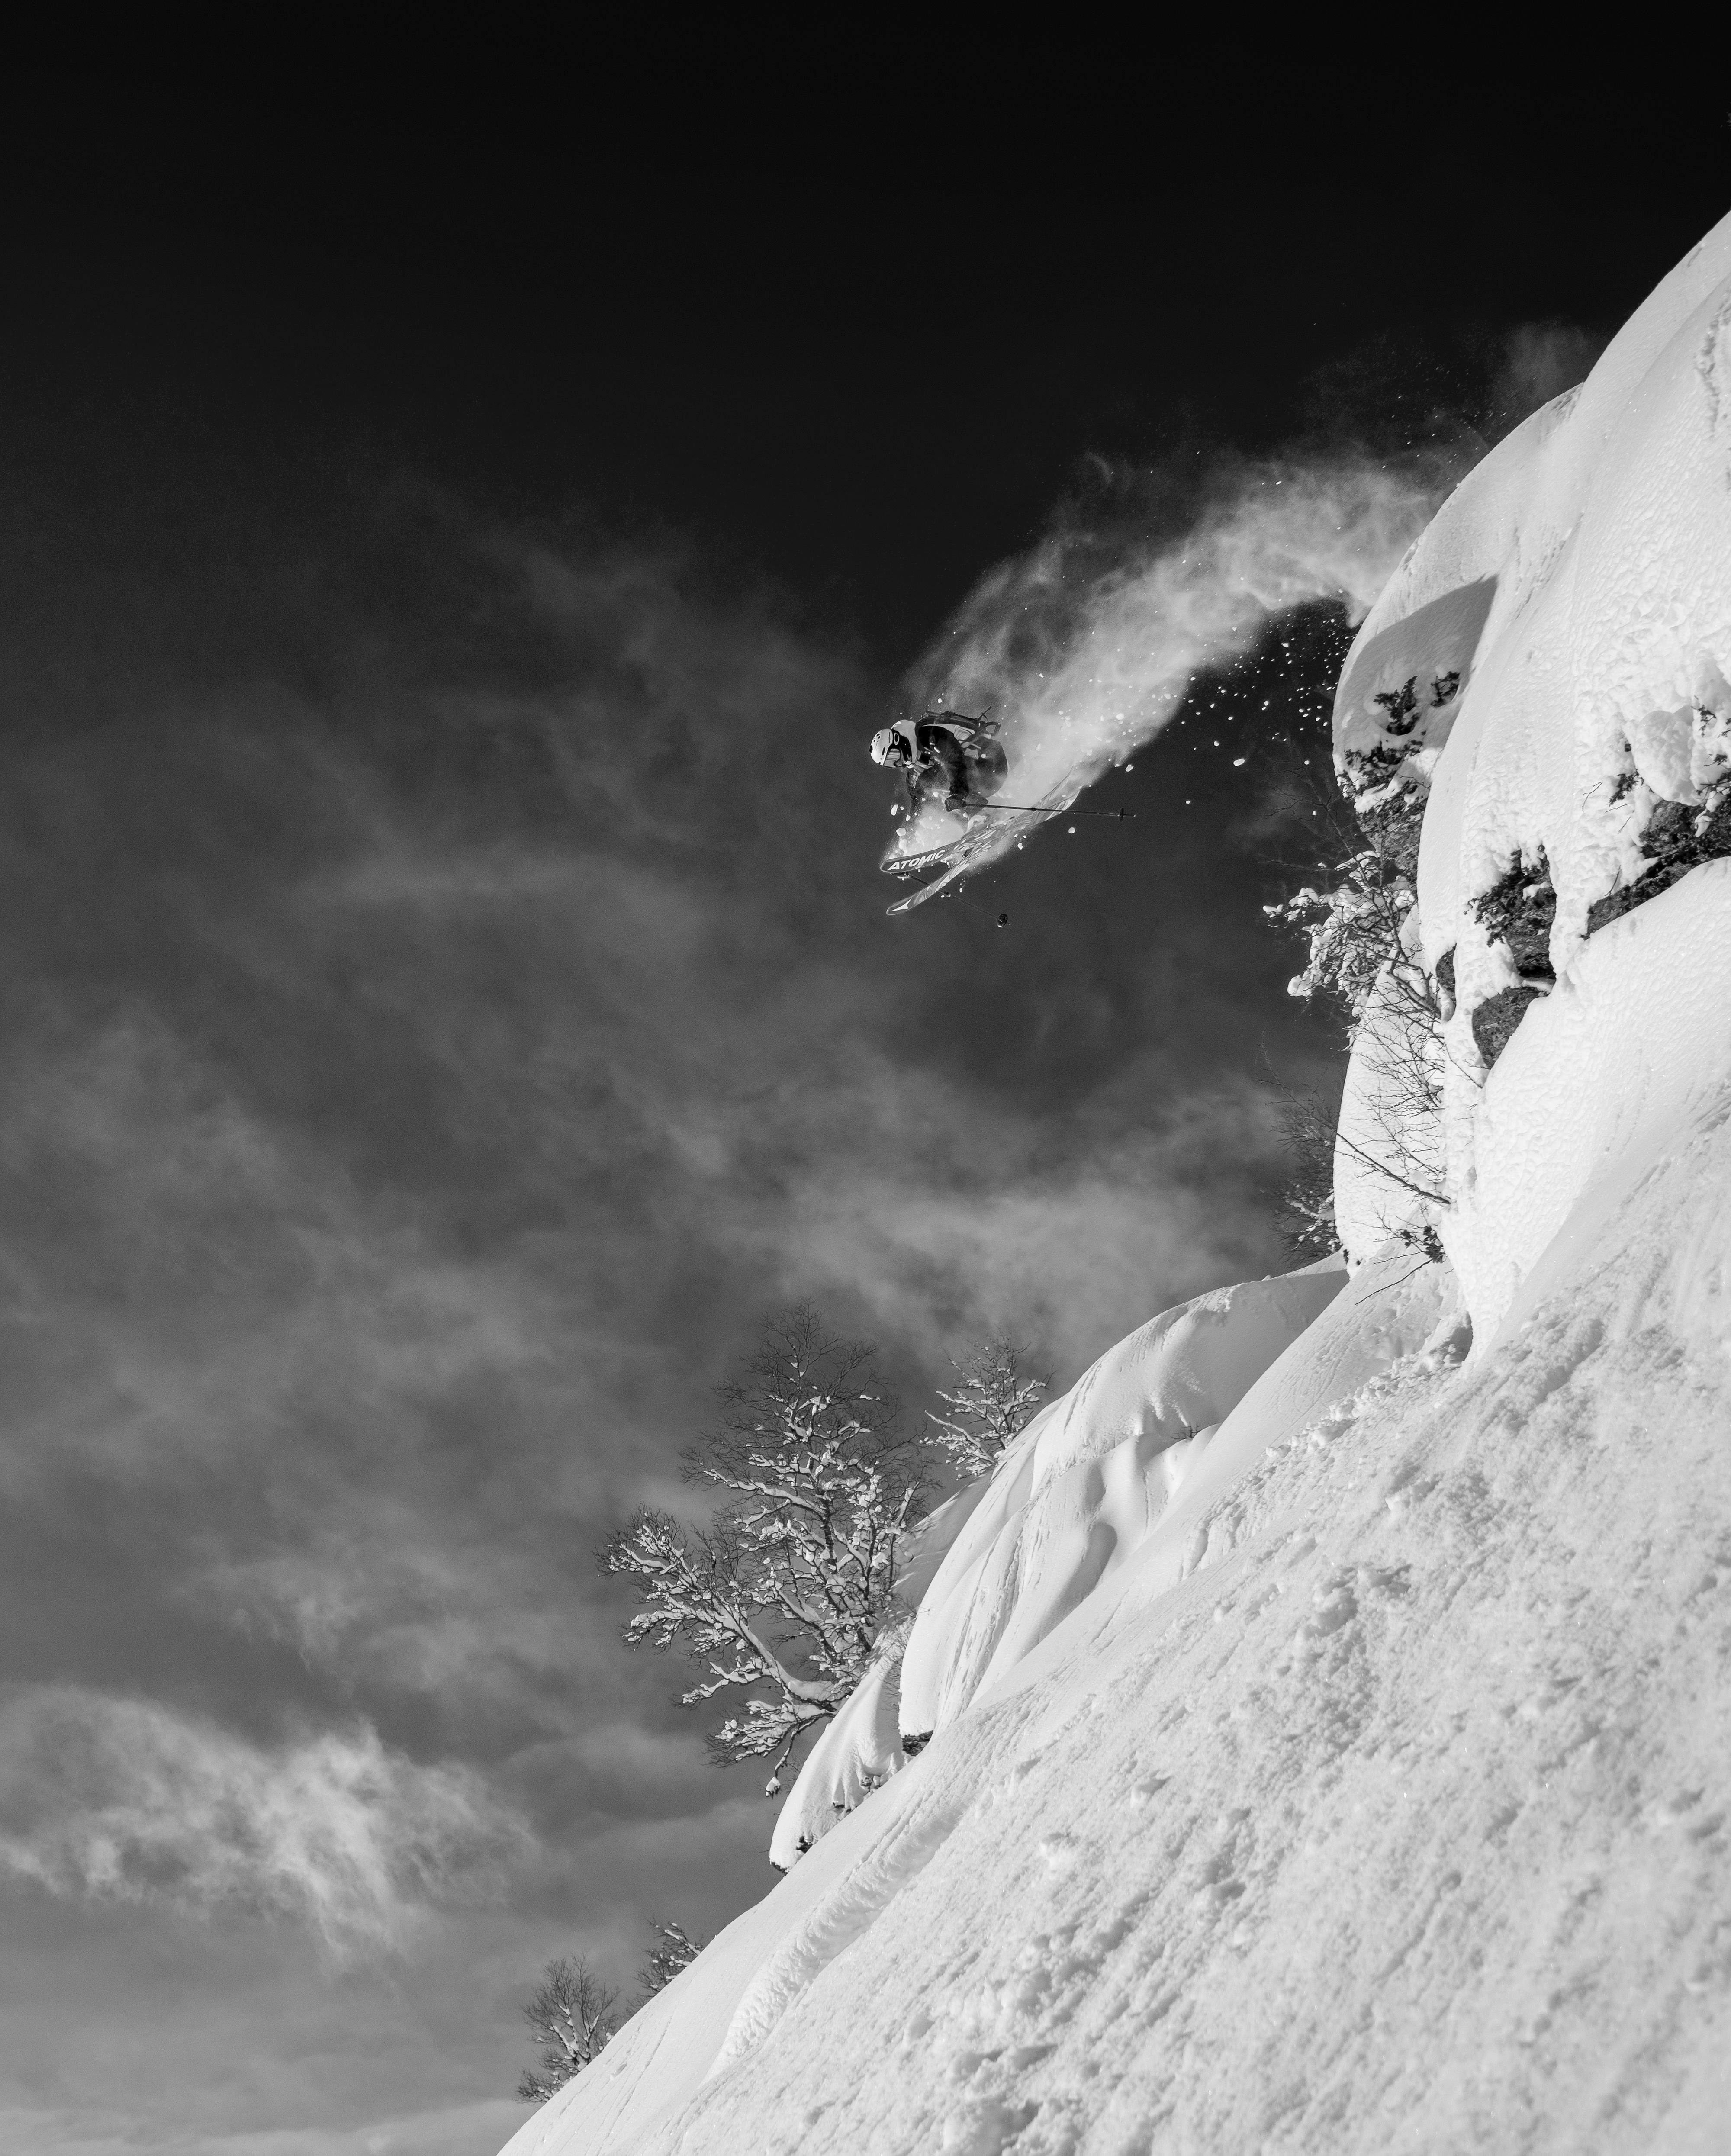 Skiing at Sogn Skisenter